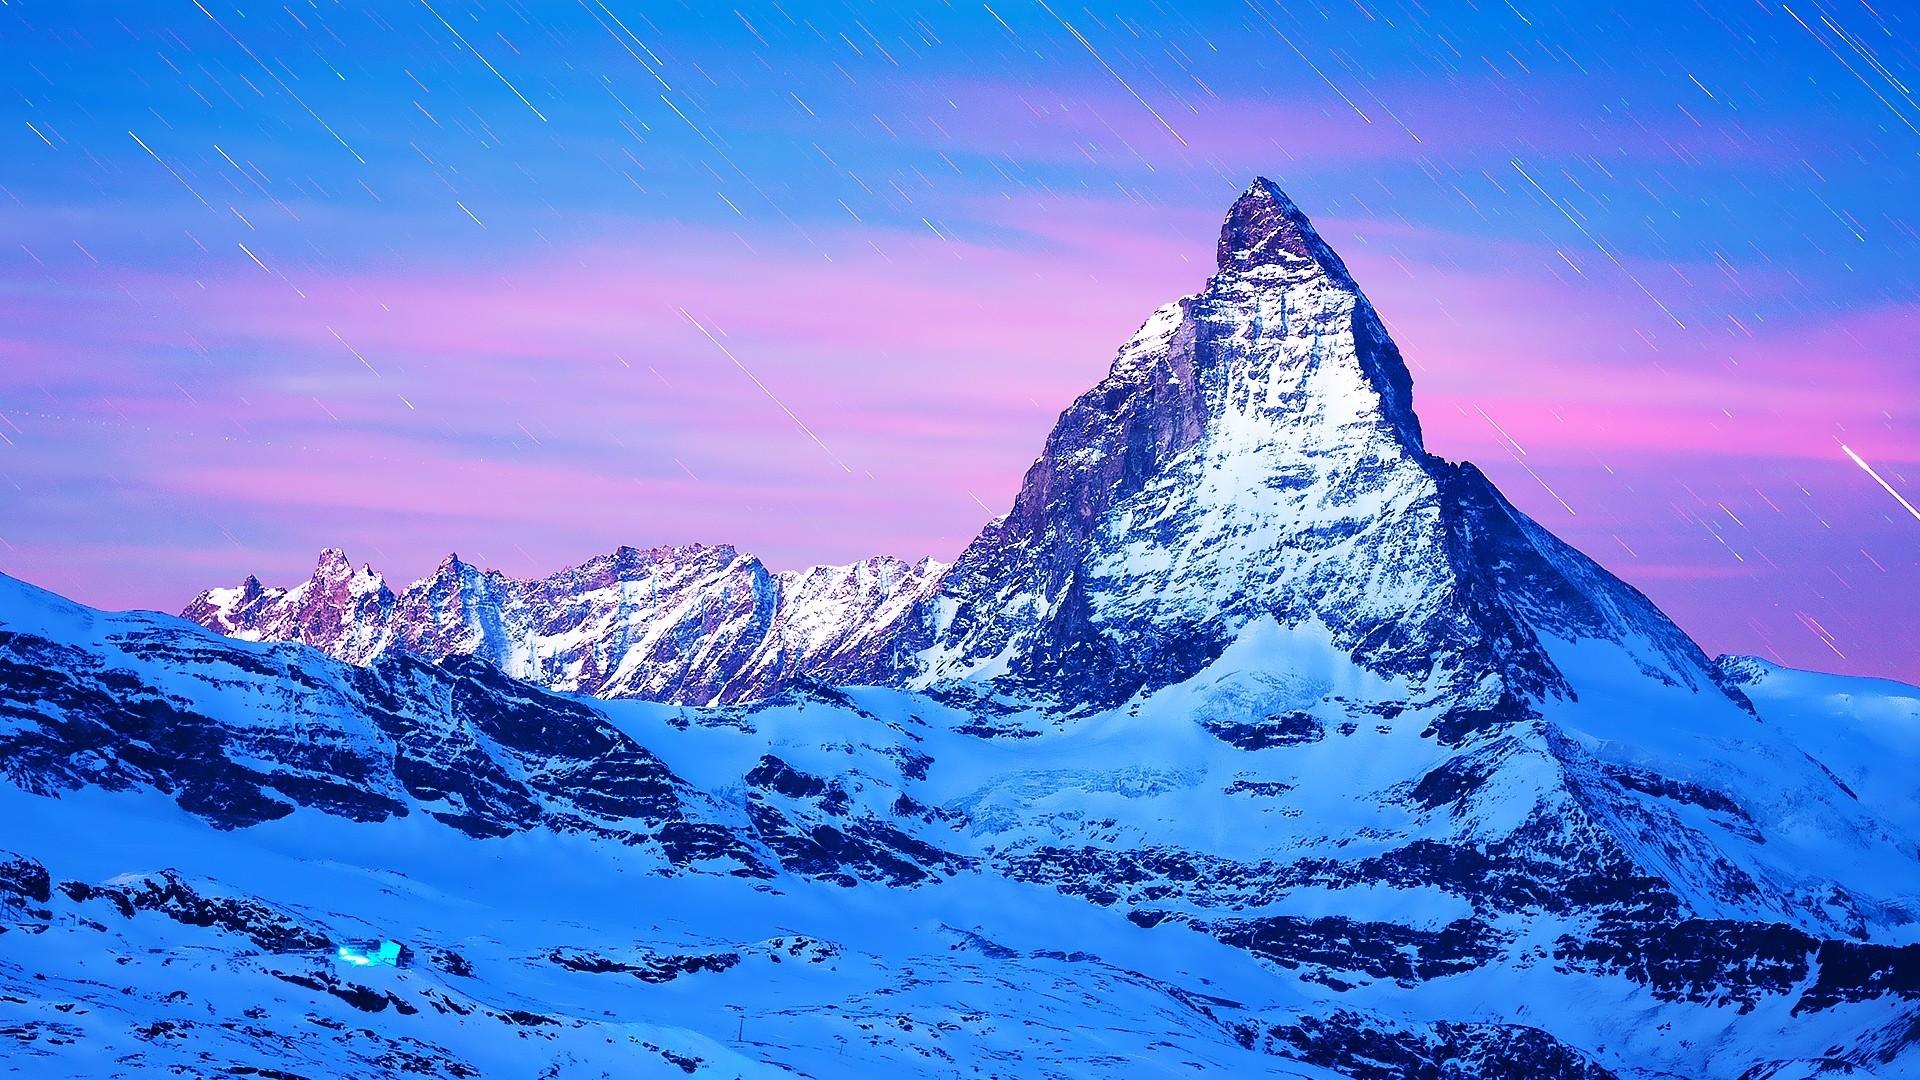 Everest wallpaper for computer